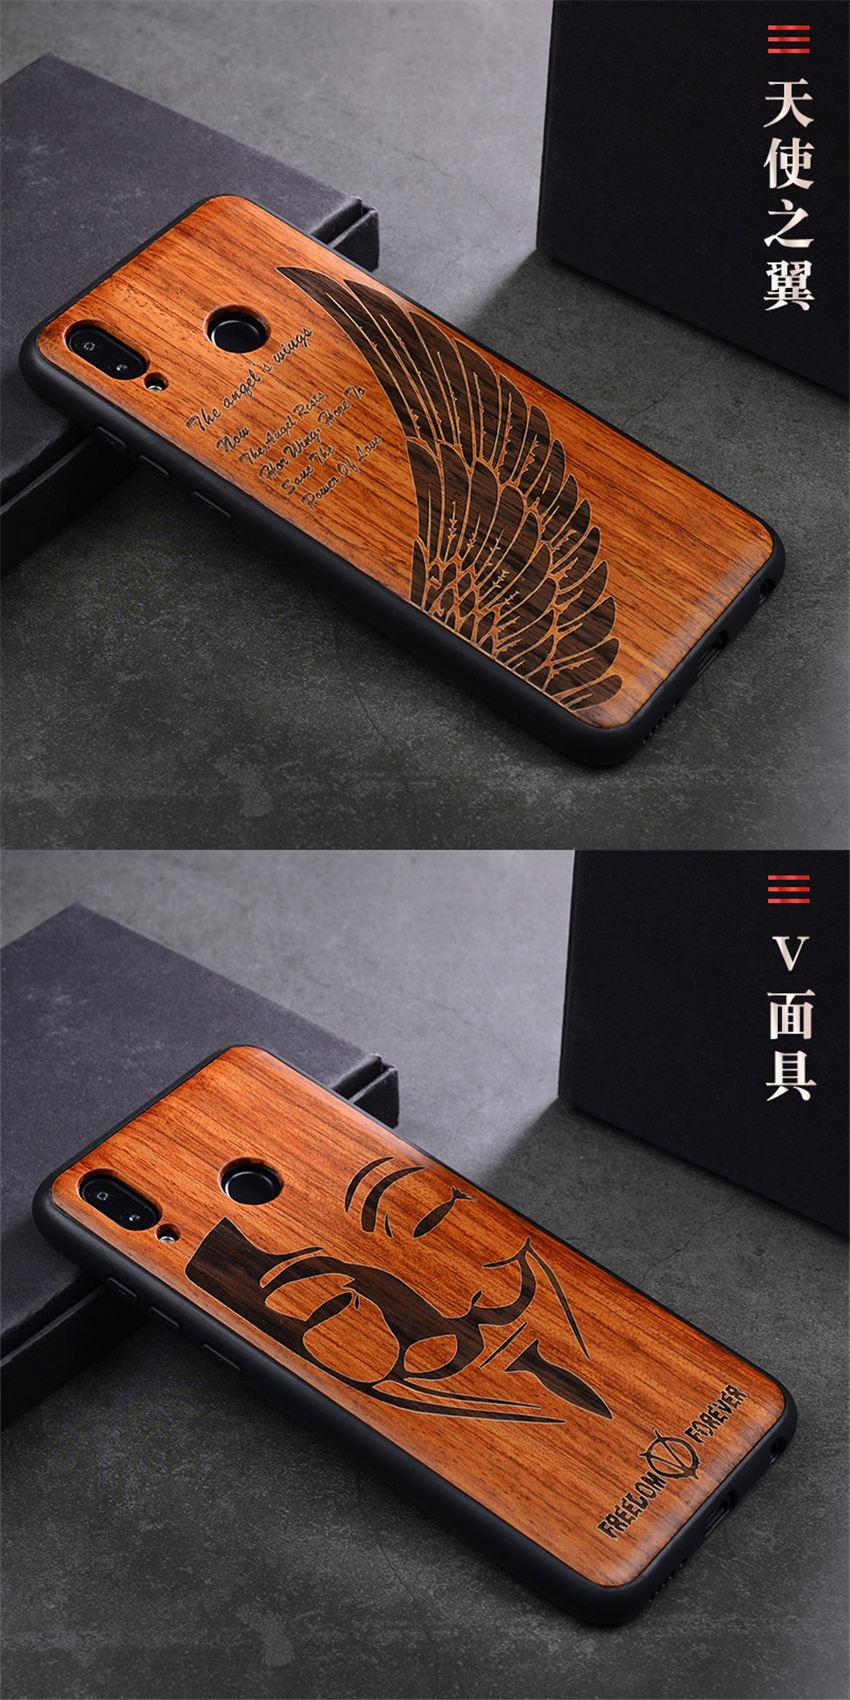 2018 New Huawei Honor 8x Case Slim Wood Back Cover TPU Bumper Case For Huawei Honor 8x Phone Cases Honor-8x (11)